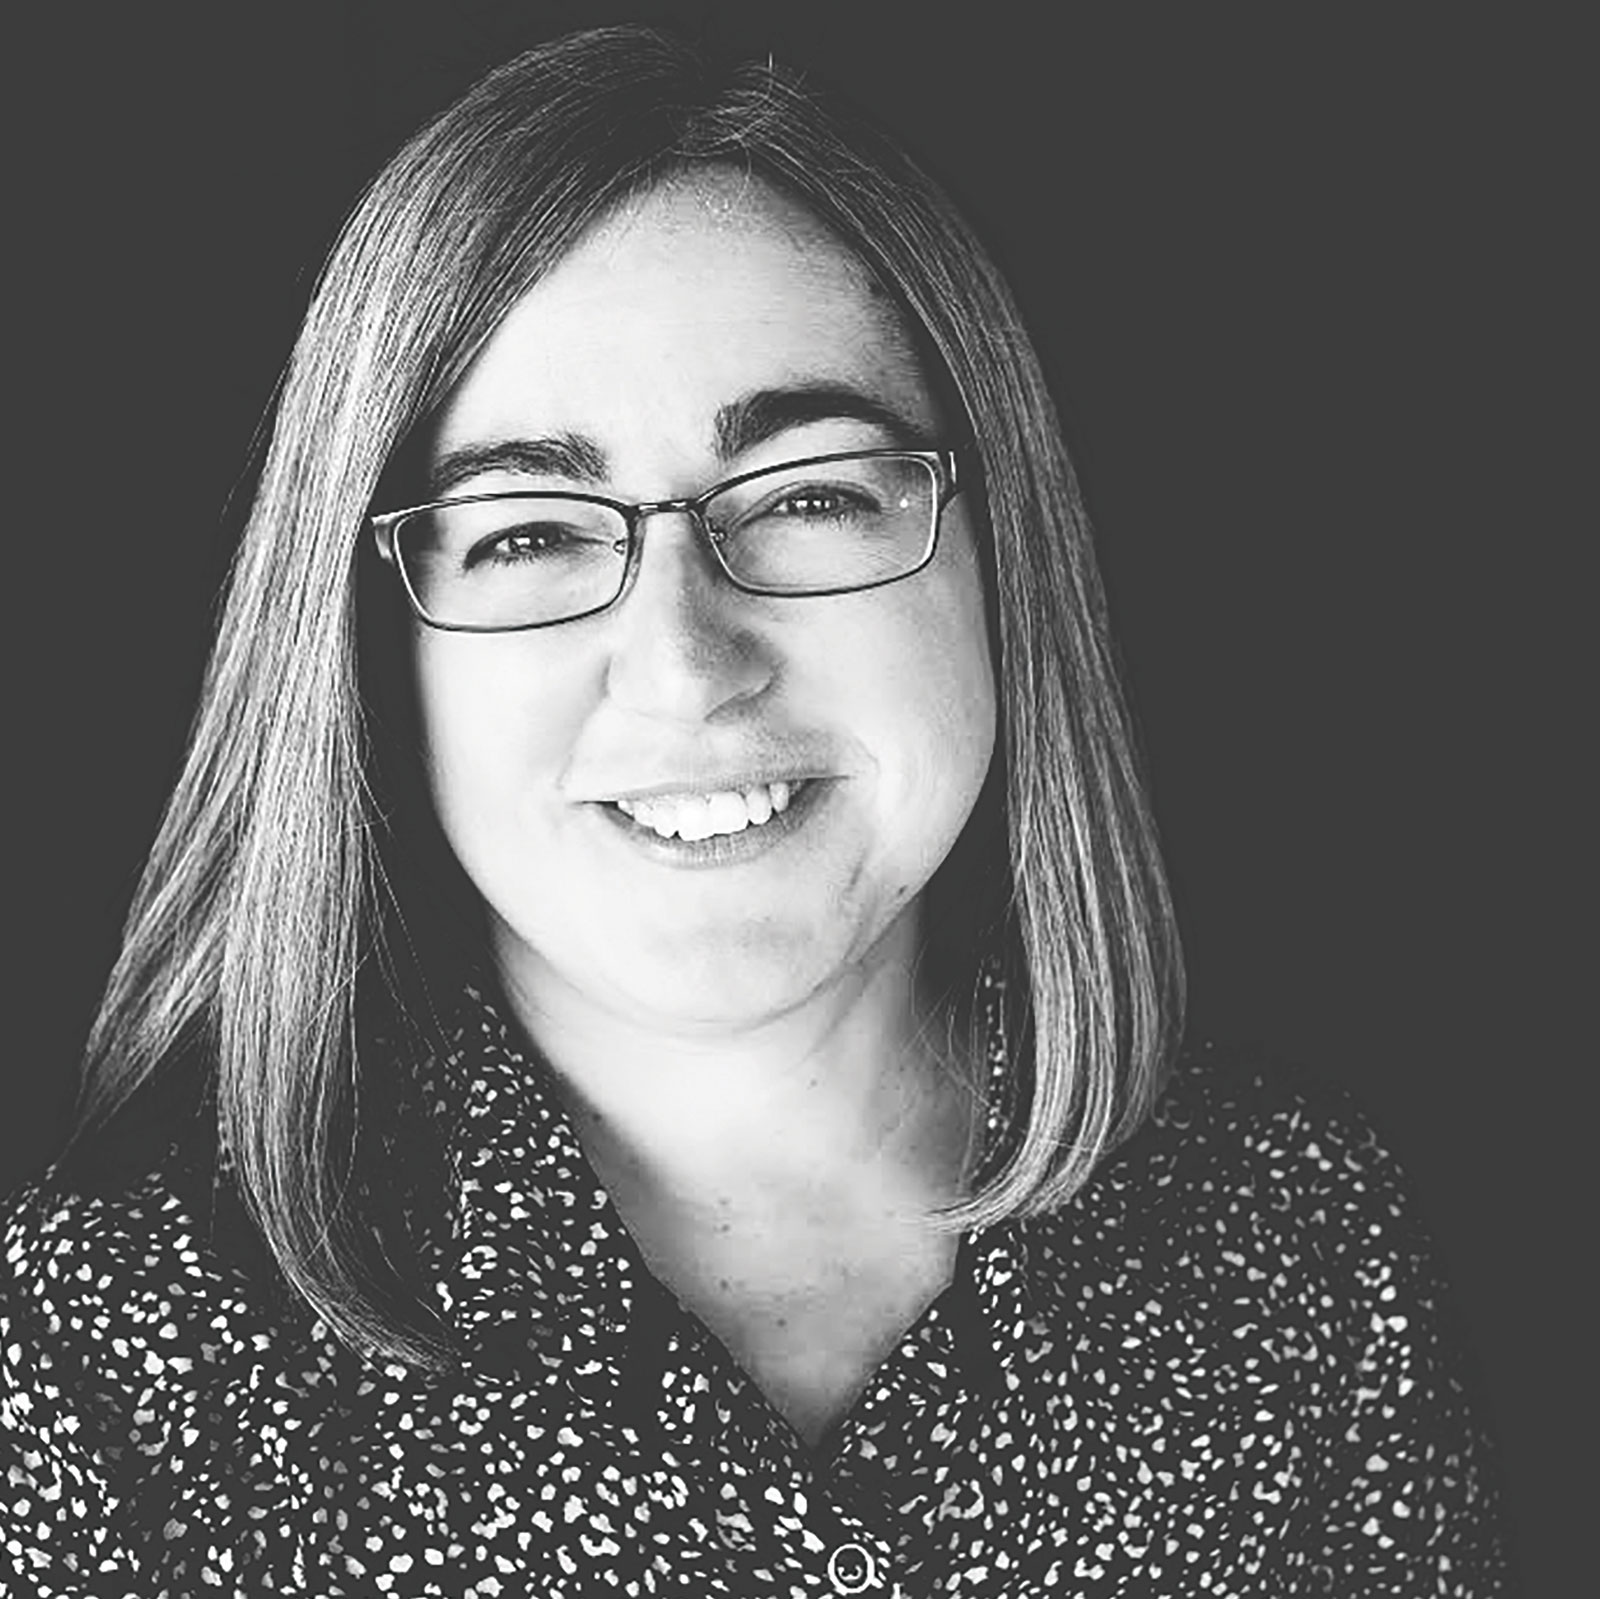 "<a href=""https://christianstandard.com/author/lauramckillipwood/"" target=""_self"">Laura Wood</a>"